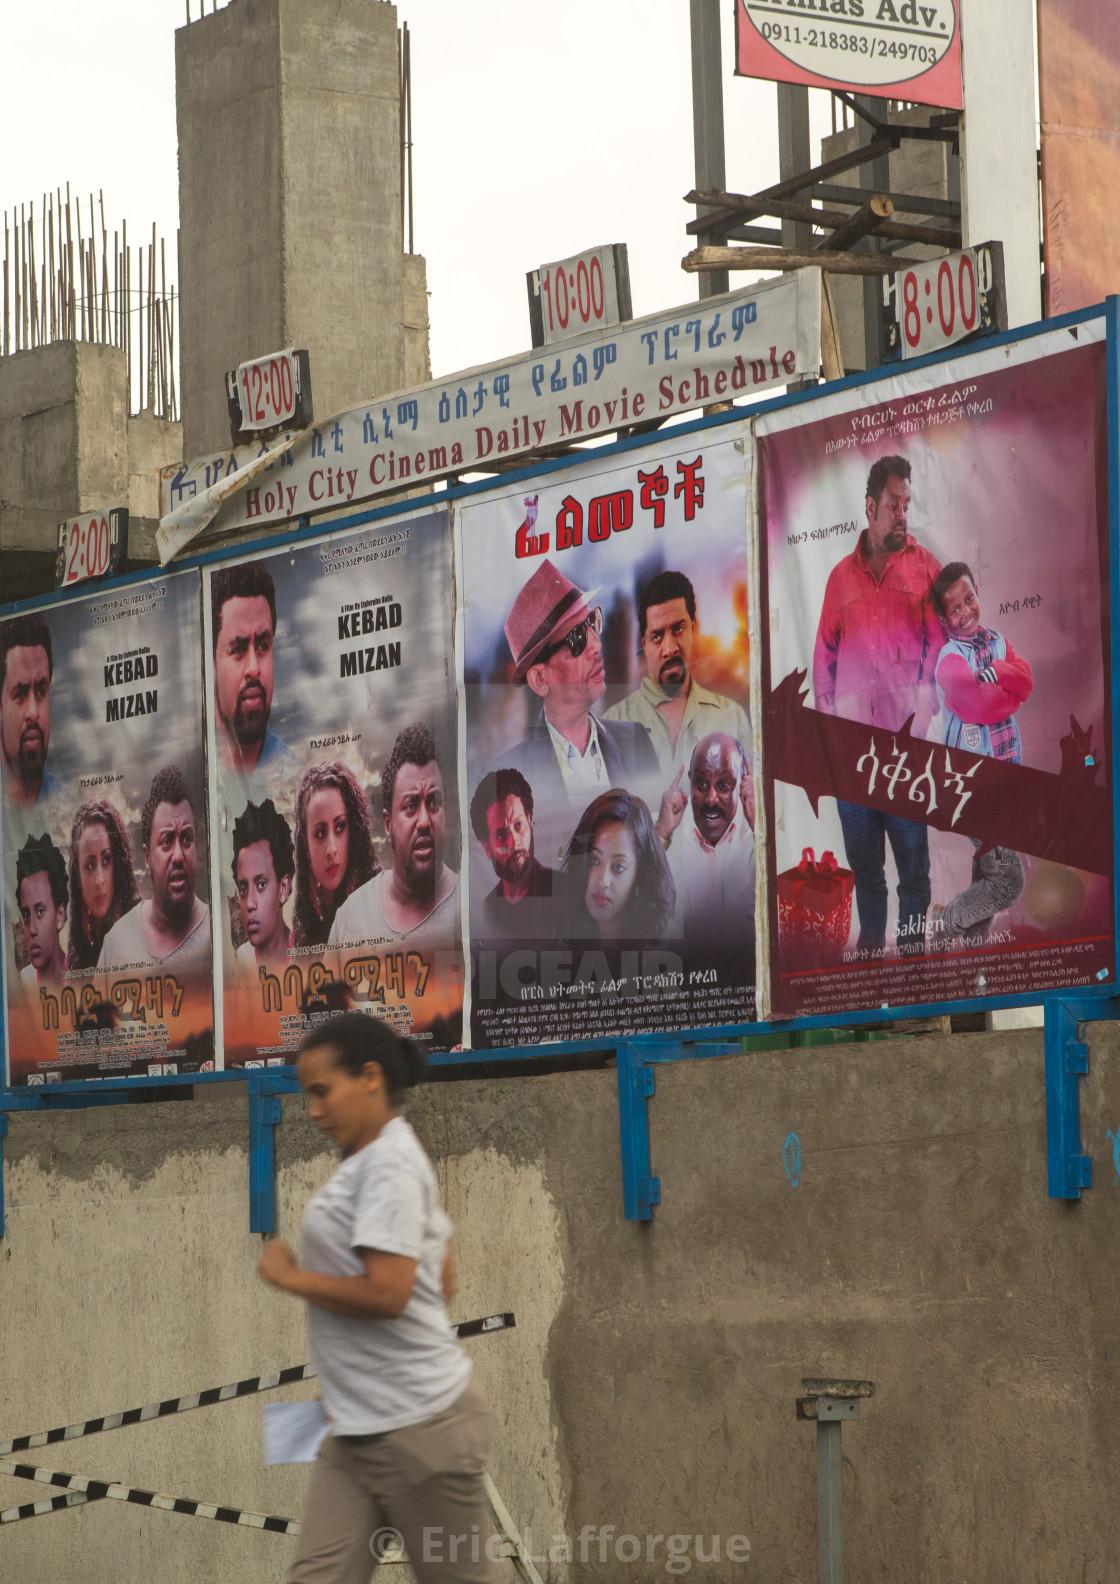 Ethiopian movie posters in the street, Addis abeba region, Addis